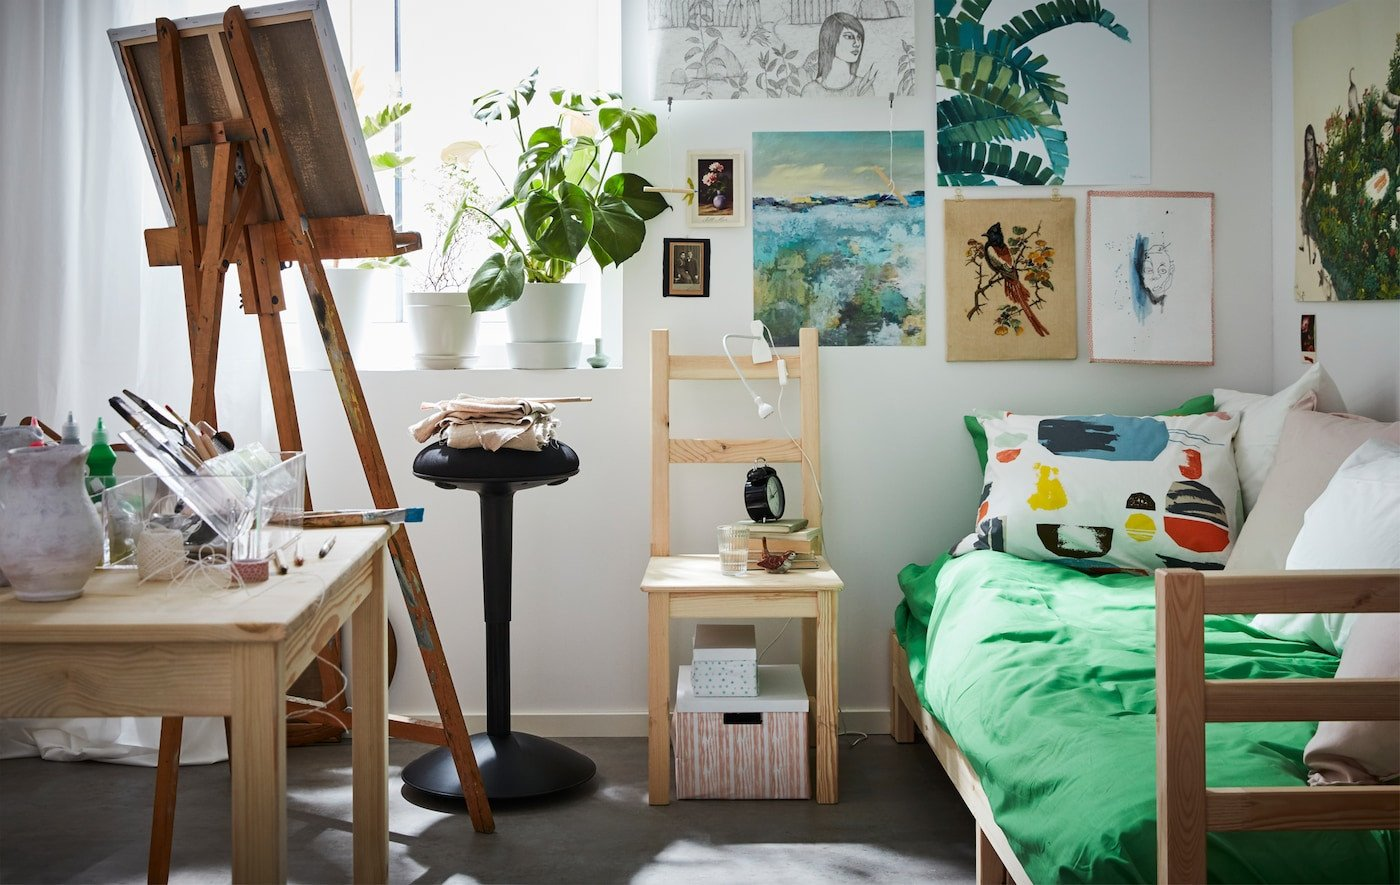 Ikea Bedroom Furniture Wardrobes Lovely Creative and Cute Dorm Room Ideas Ikea